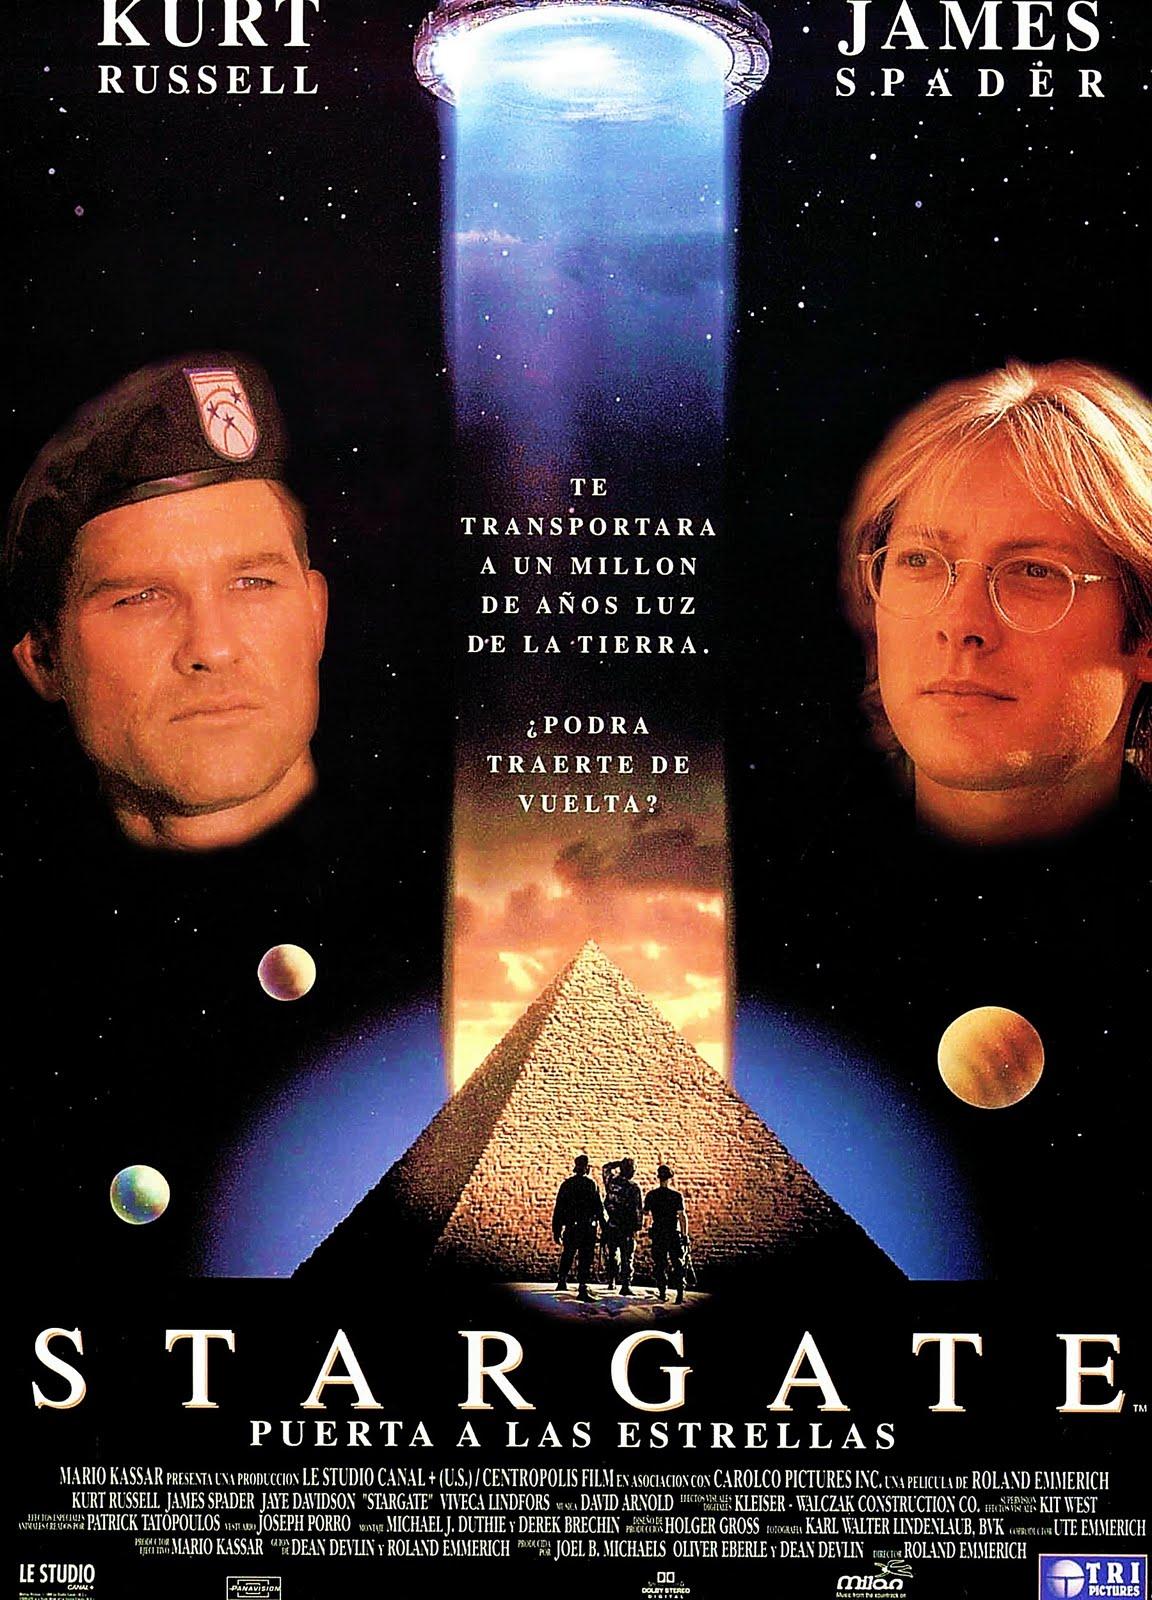 Stargate, puerta a las estrellas (1994)